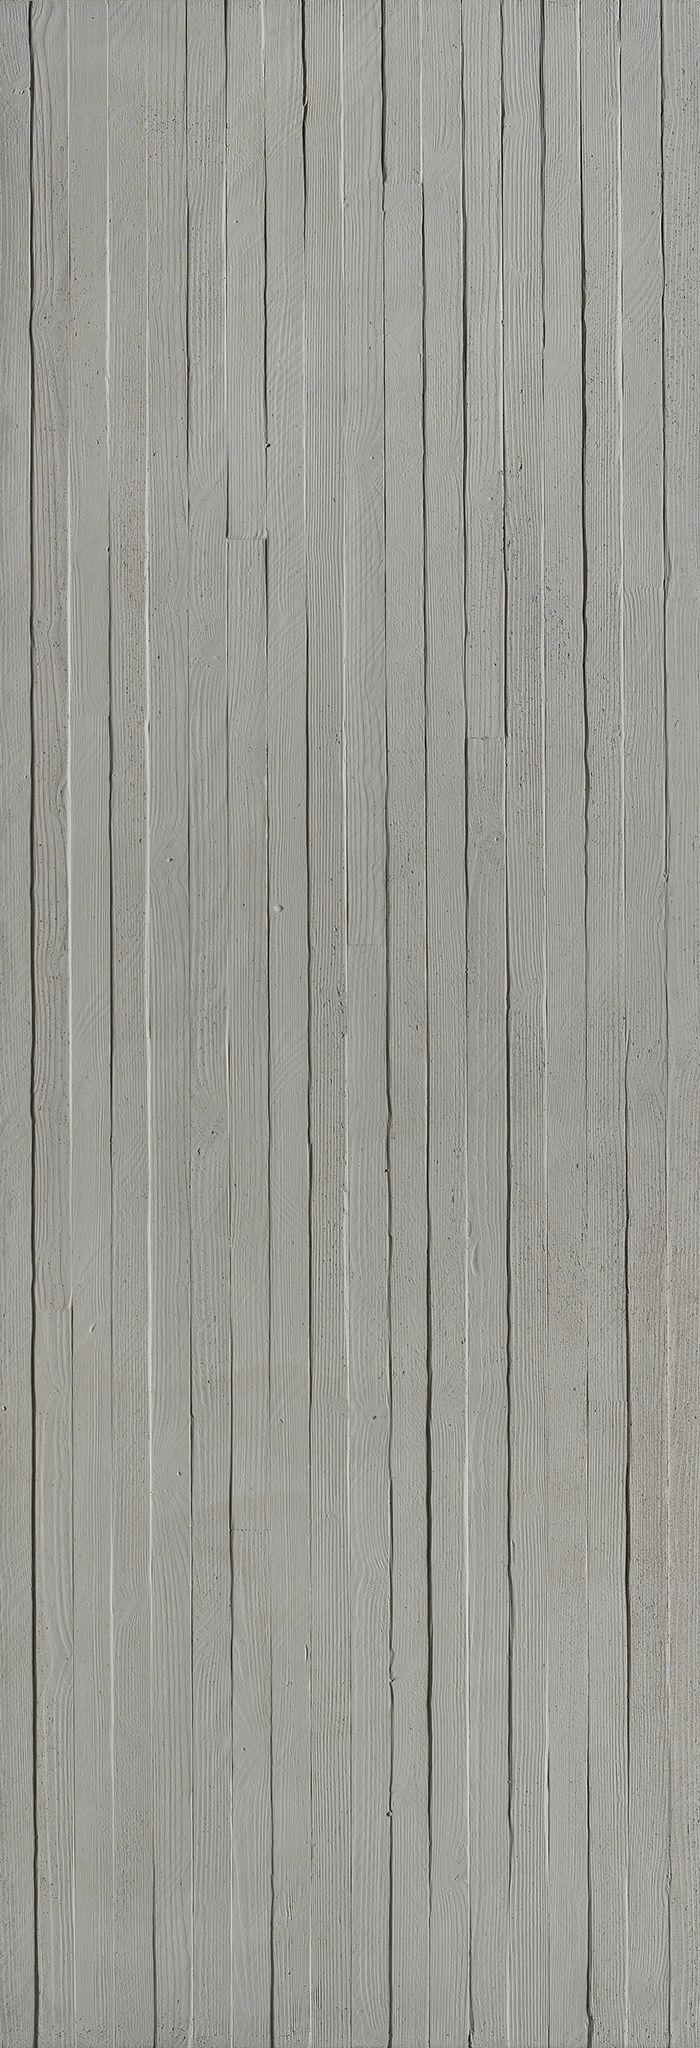 panbeton vertical planks panbeton 2015 pinterest planches. Black Bedroom Furniture Sets. Home Design Ideas